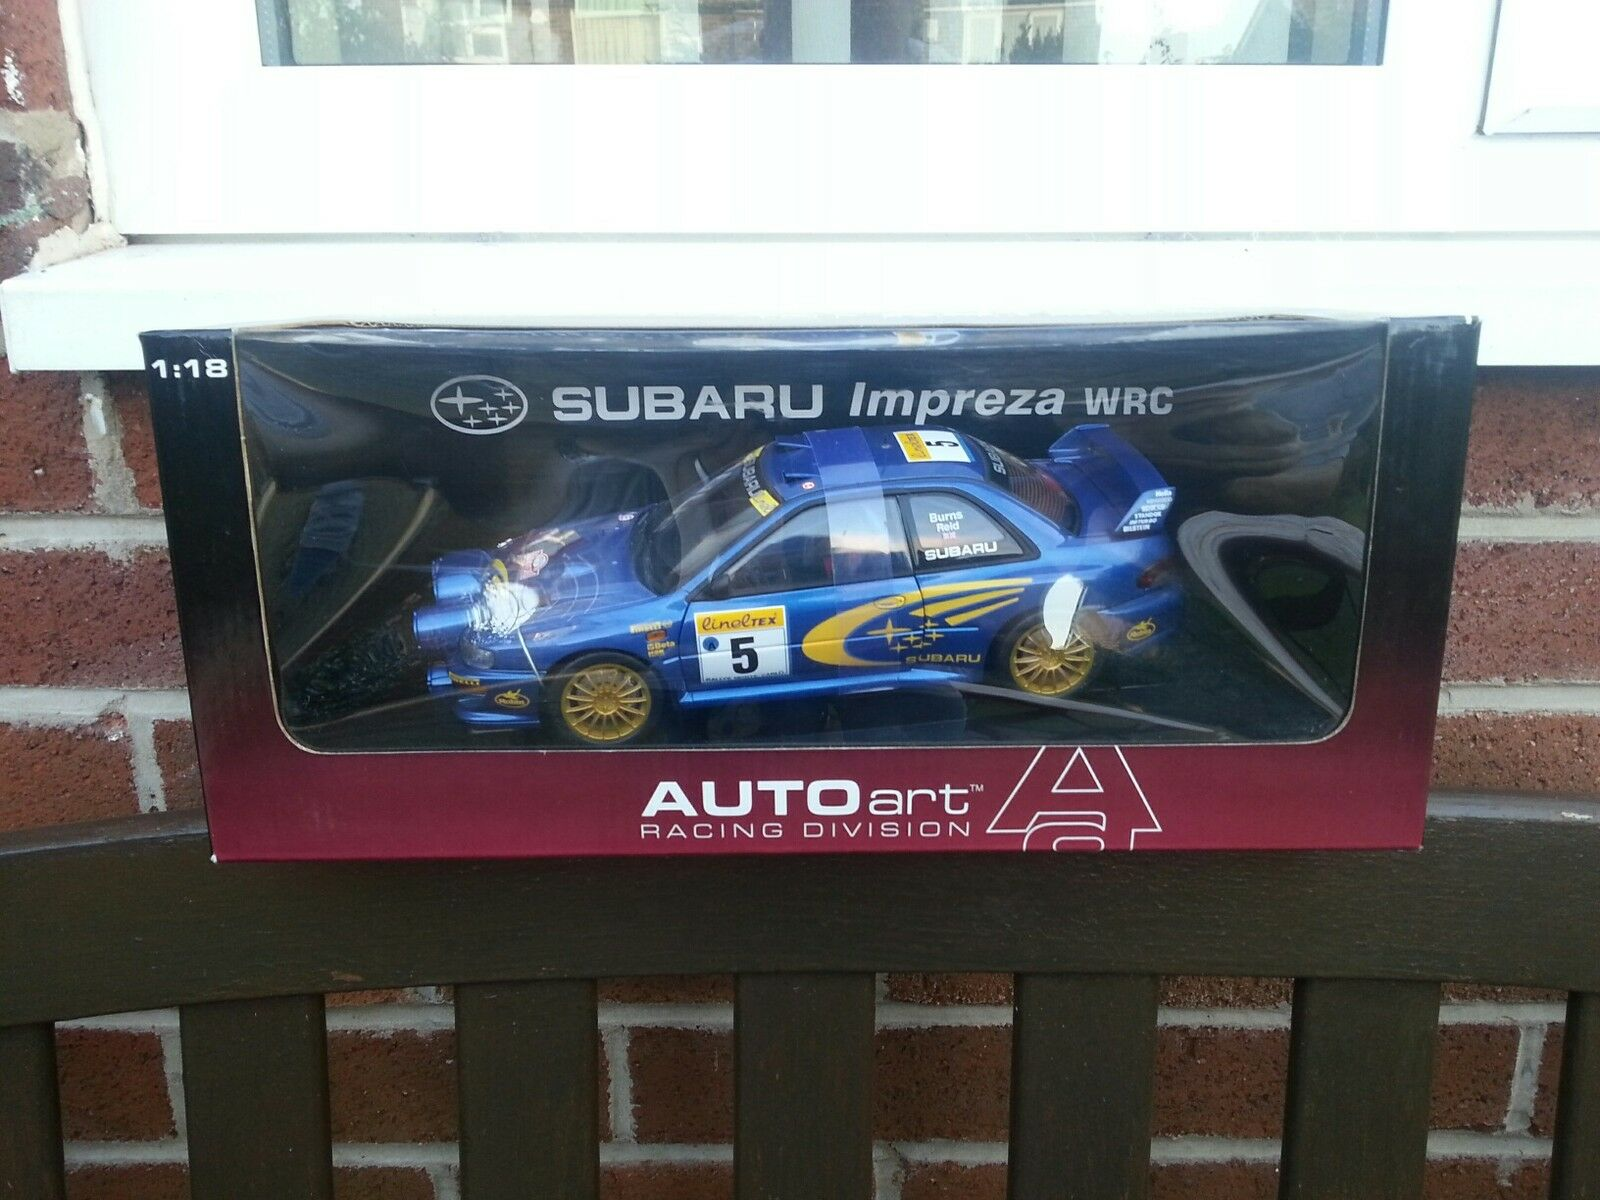 Autoarte 1 18 Subaru Impreza 1999 Wric Monte autolo Nightstage 8994